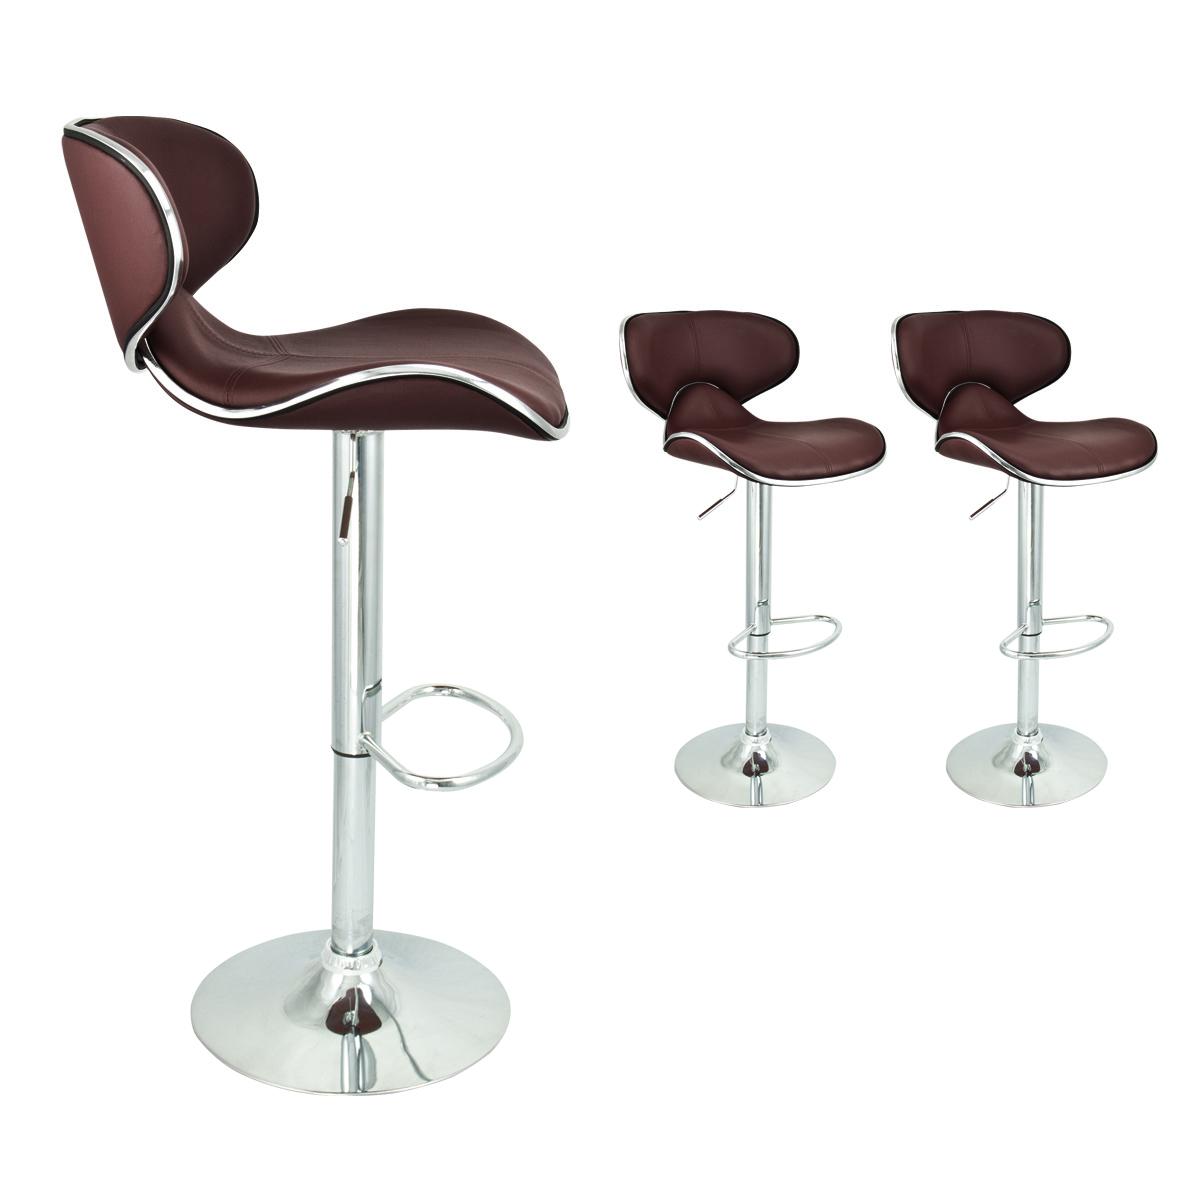 2 Brown Modern Adjustable Barstool Swivel Elegant PU  : 39076as from www.ebay.com size 1200 x 1200 jpeg 298kB